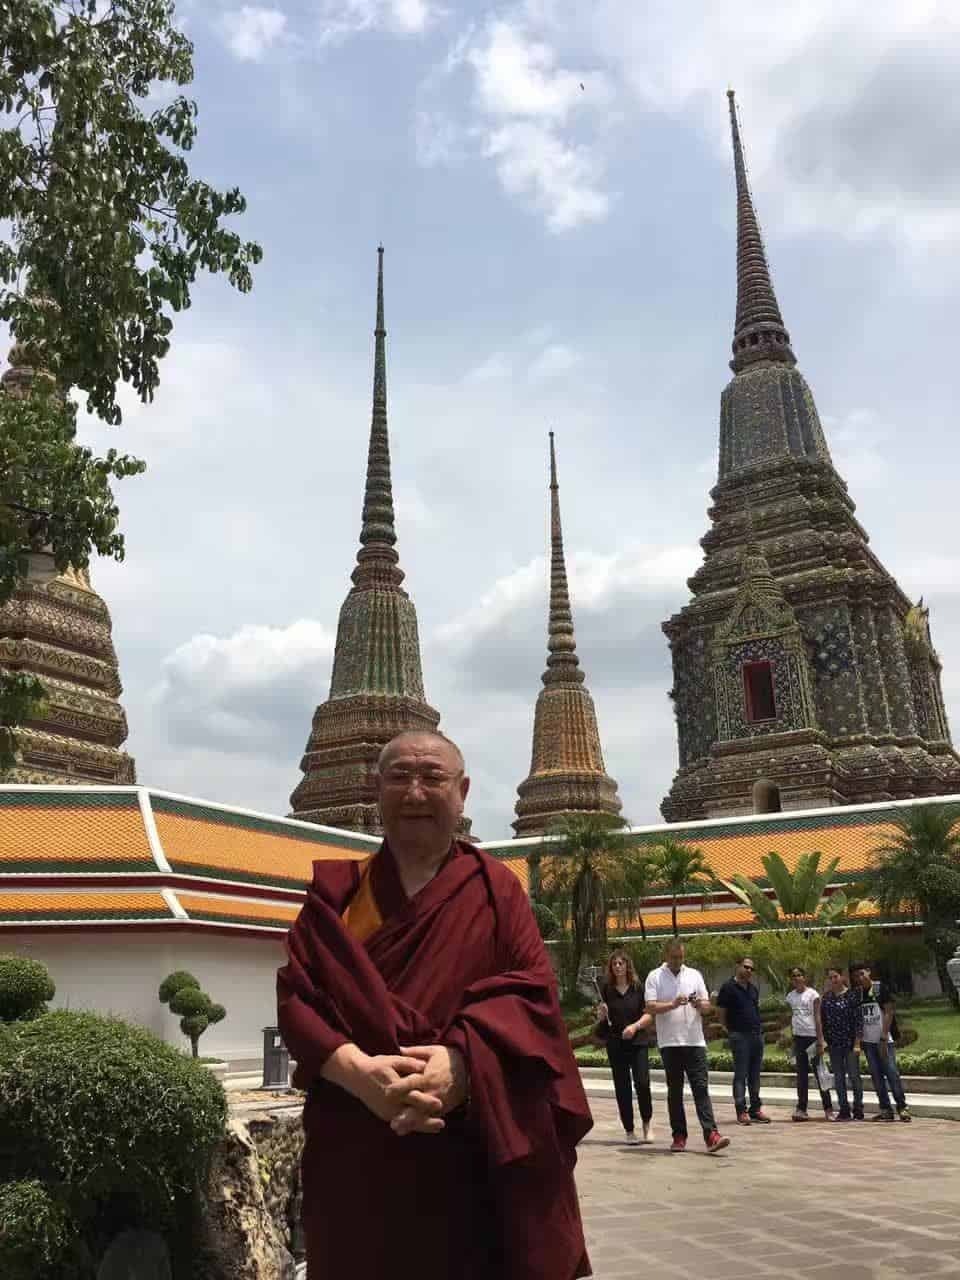 Gosok Rinpoche Thailand 2017 T021 c52734e840ac195503f932fda02430f